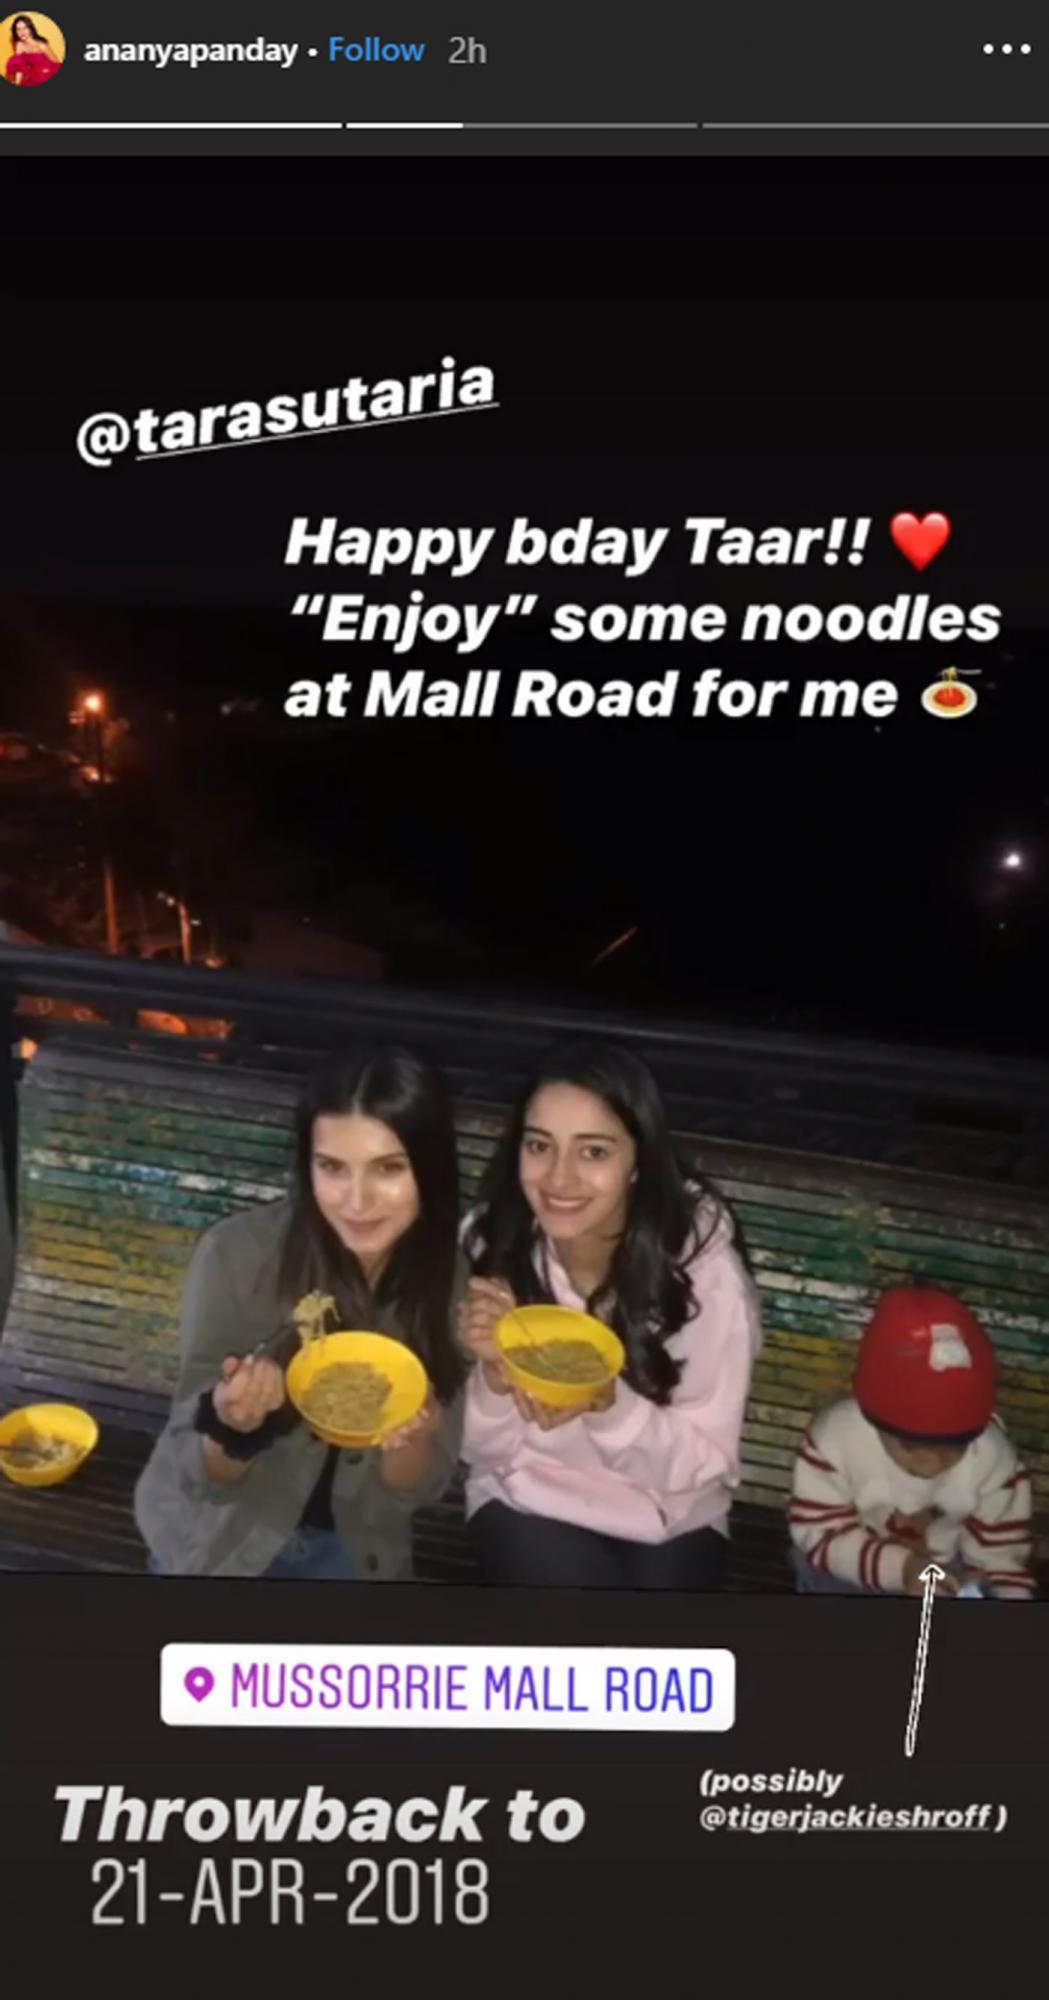 Ananya Panday Has a Nostalgic Birthday Wish for Tara Sutaria